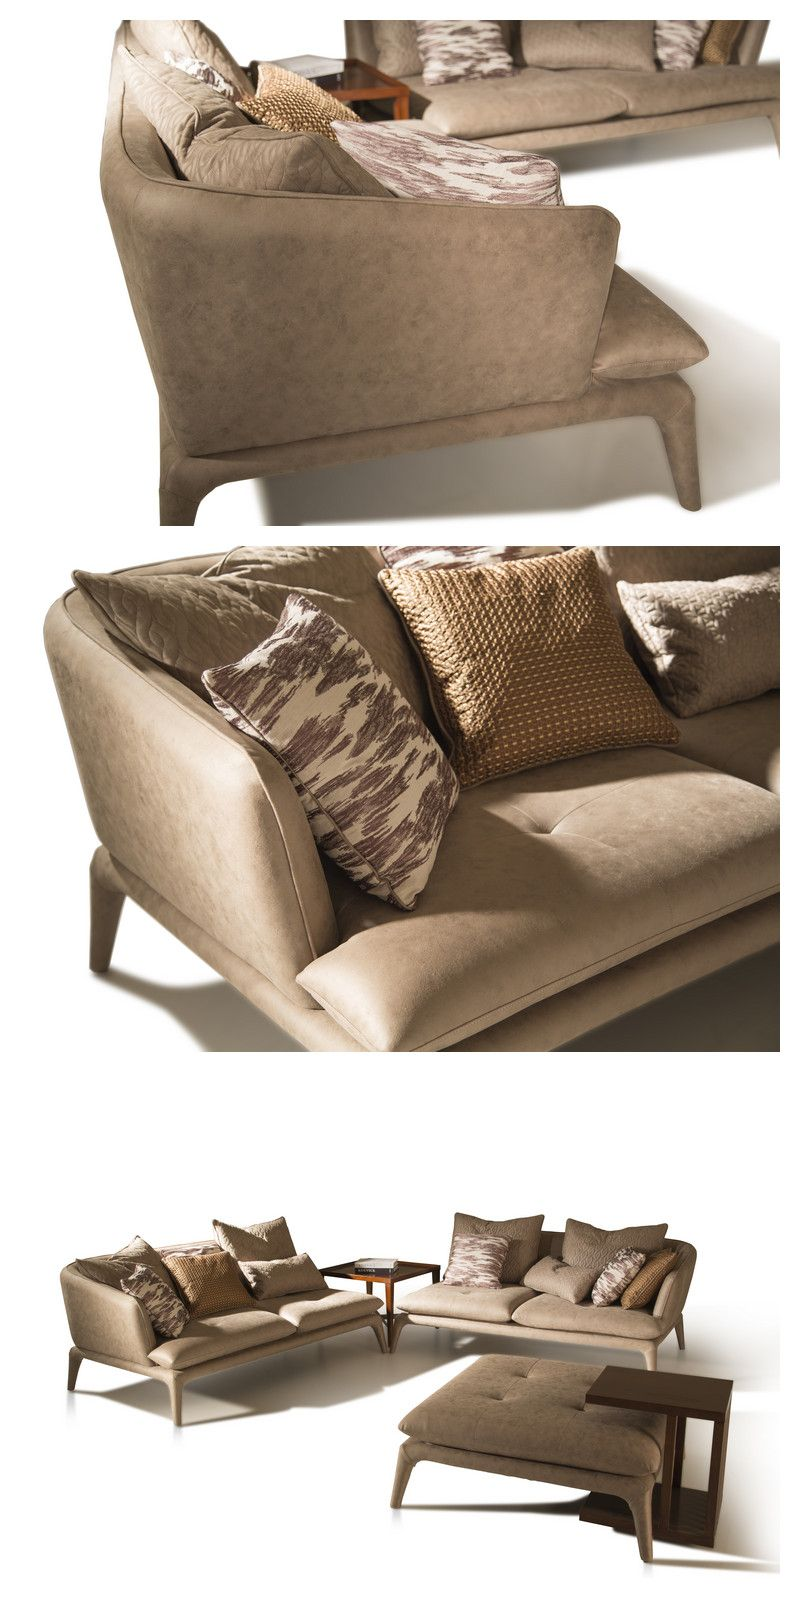 Modern High Quality Furniture Upholstered Leg Big Comfy